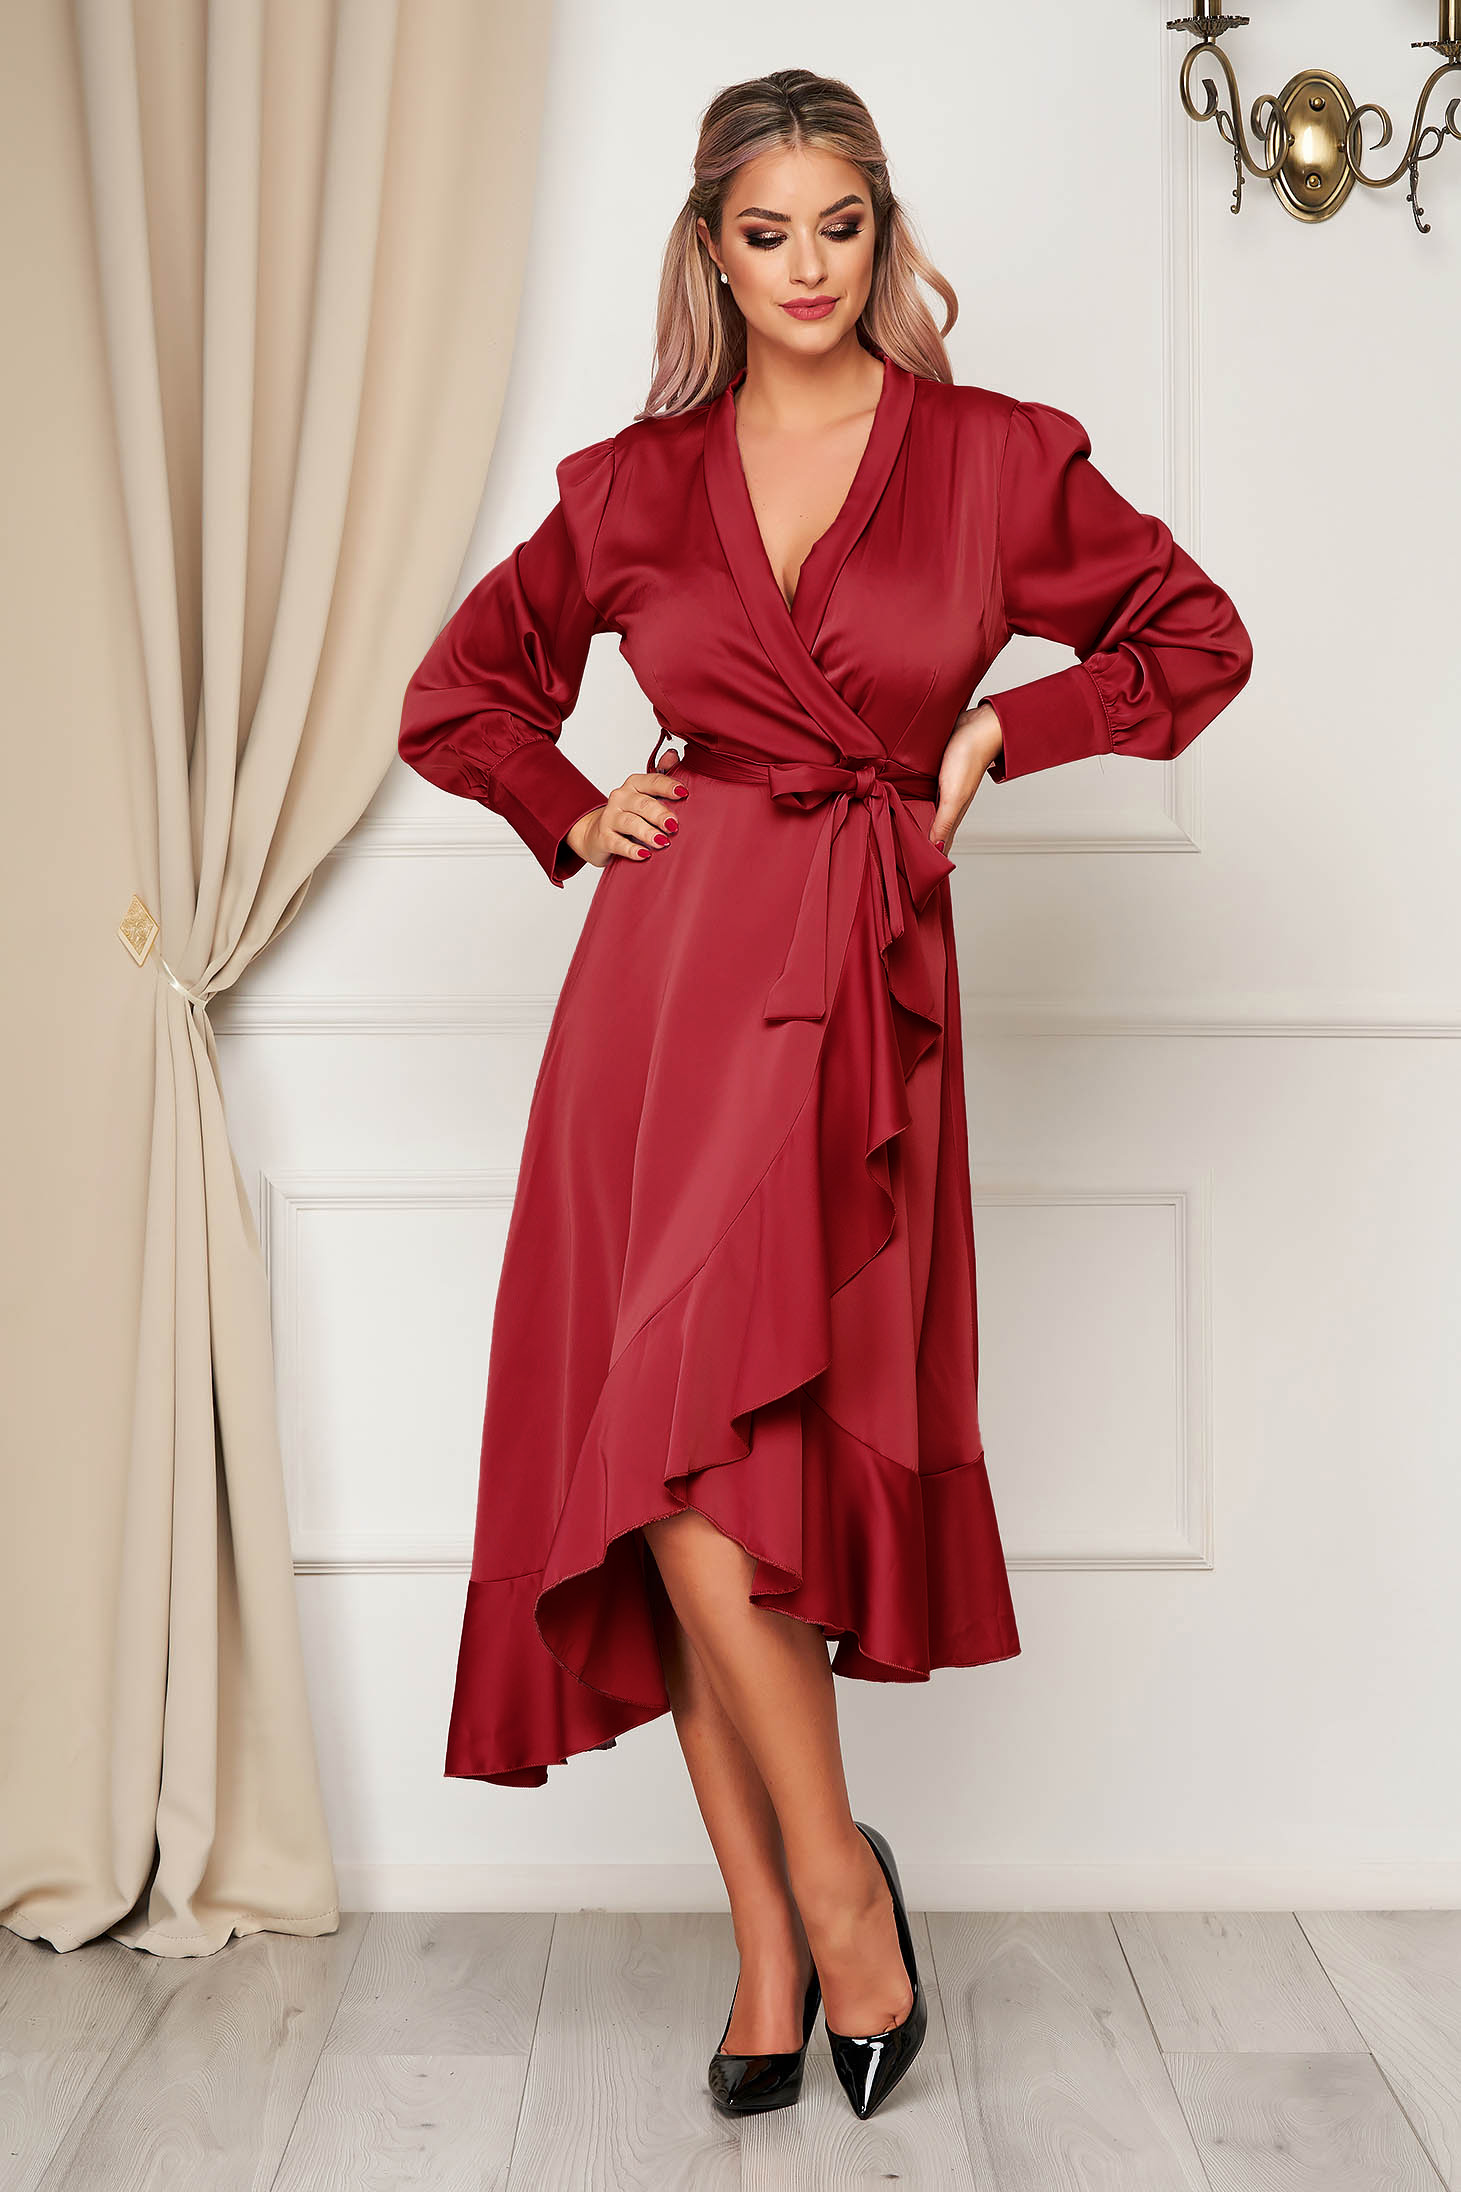 Rochie SunShine visinie eleganta in clos decolteu petrecut din material satinat cu volanase la baza rochiei accesorizata cu cordon